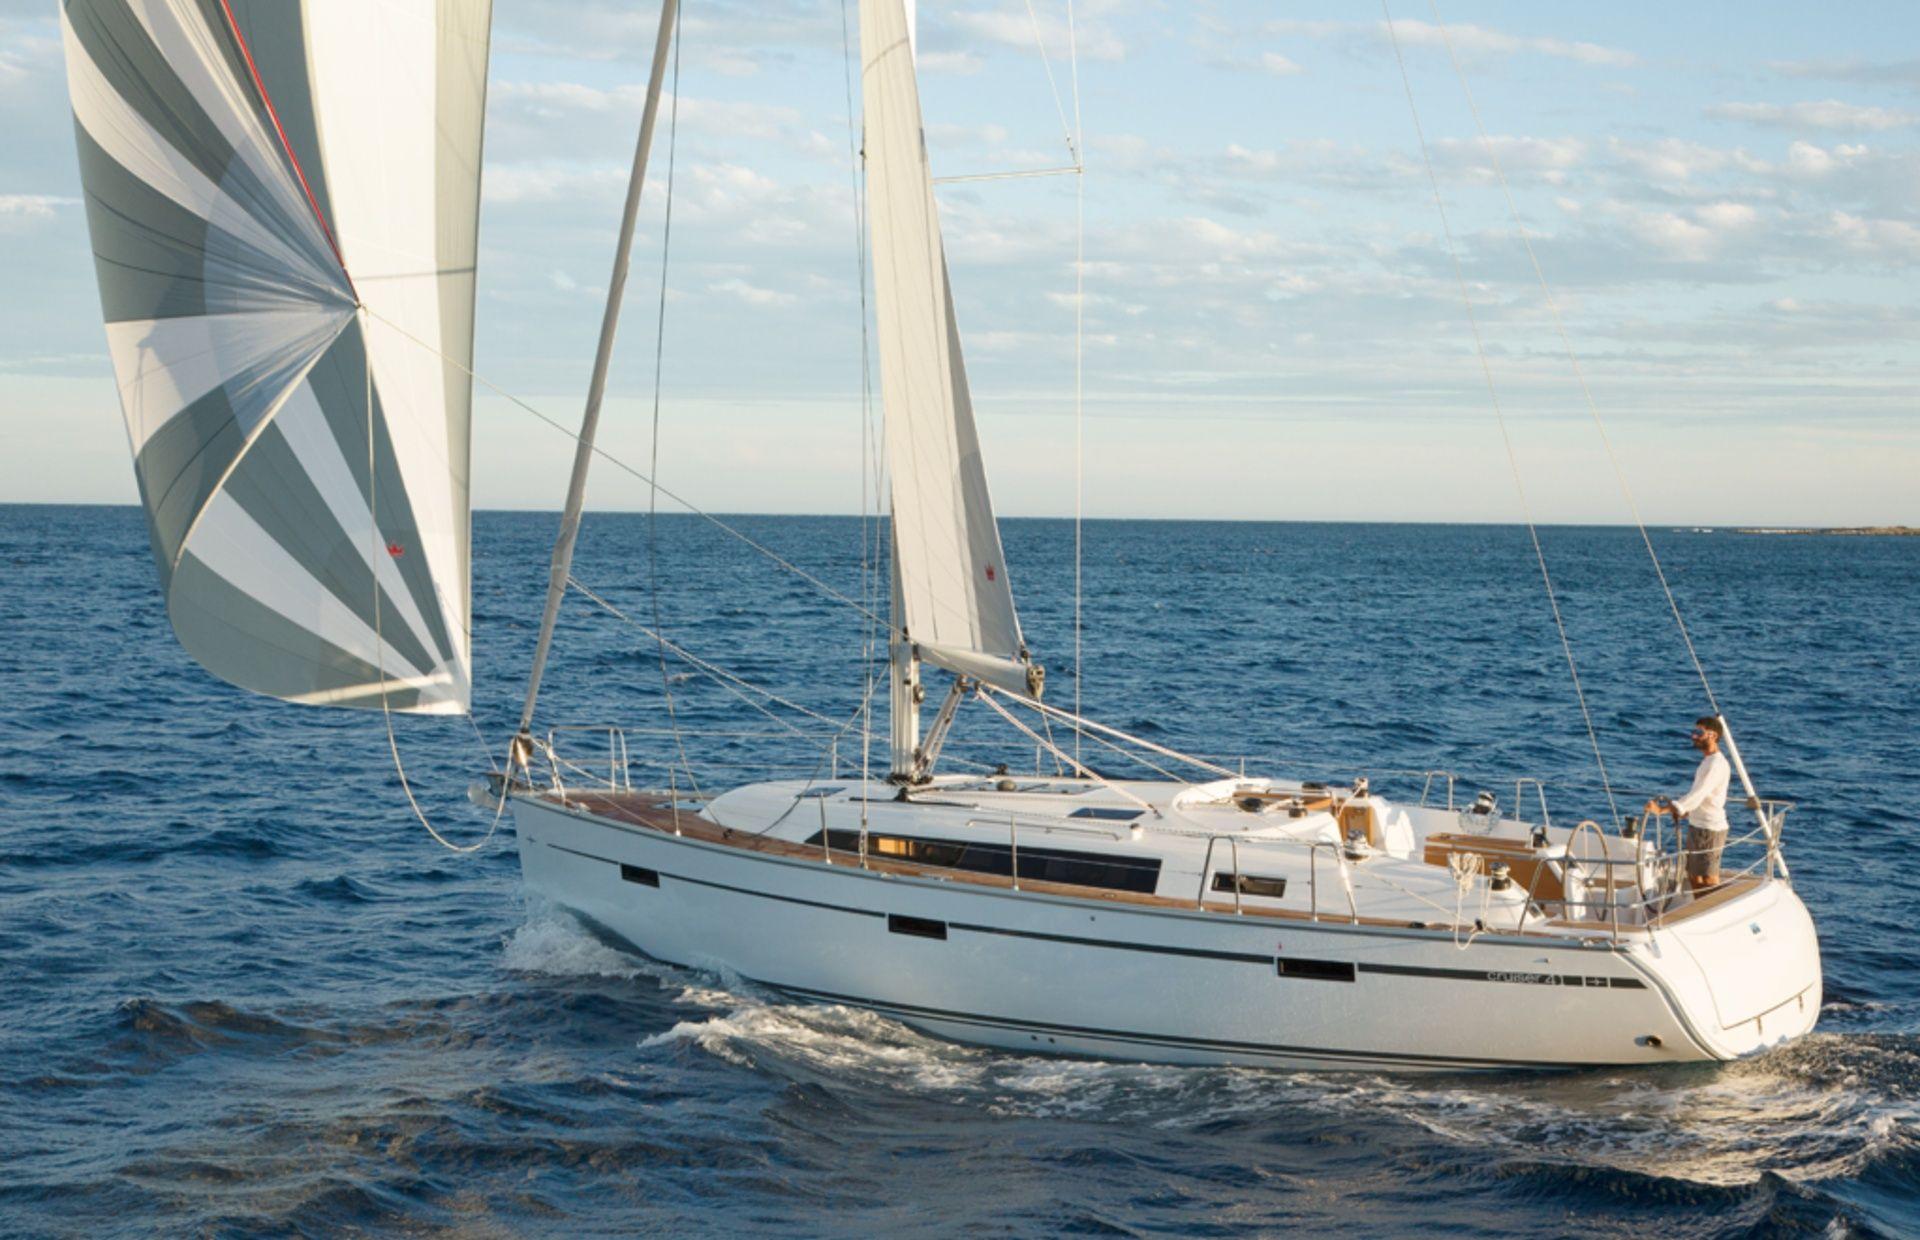 https://media.insailing.com/boat/adriatic-challenge/image_1568992343323.jpg